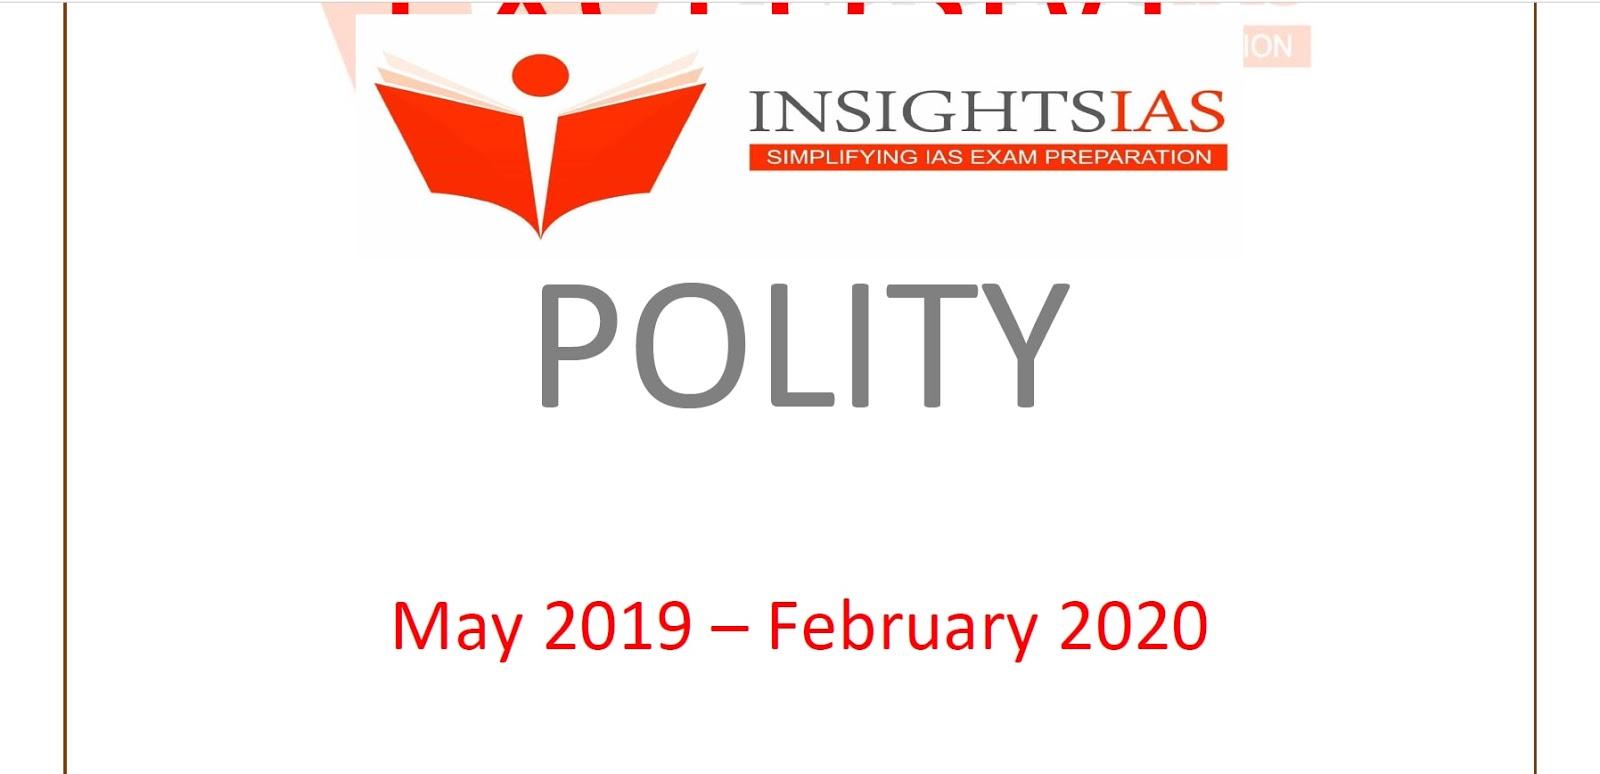 Insights IAS Polity